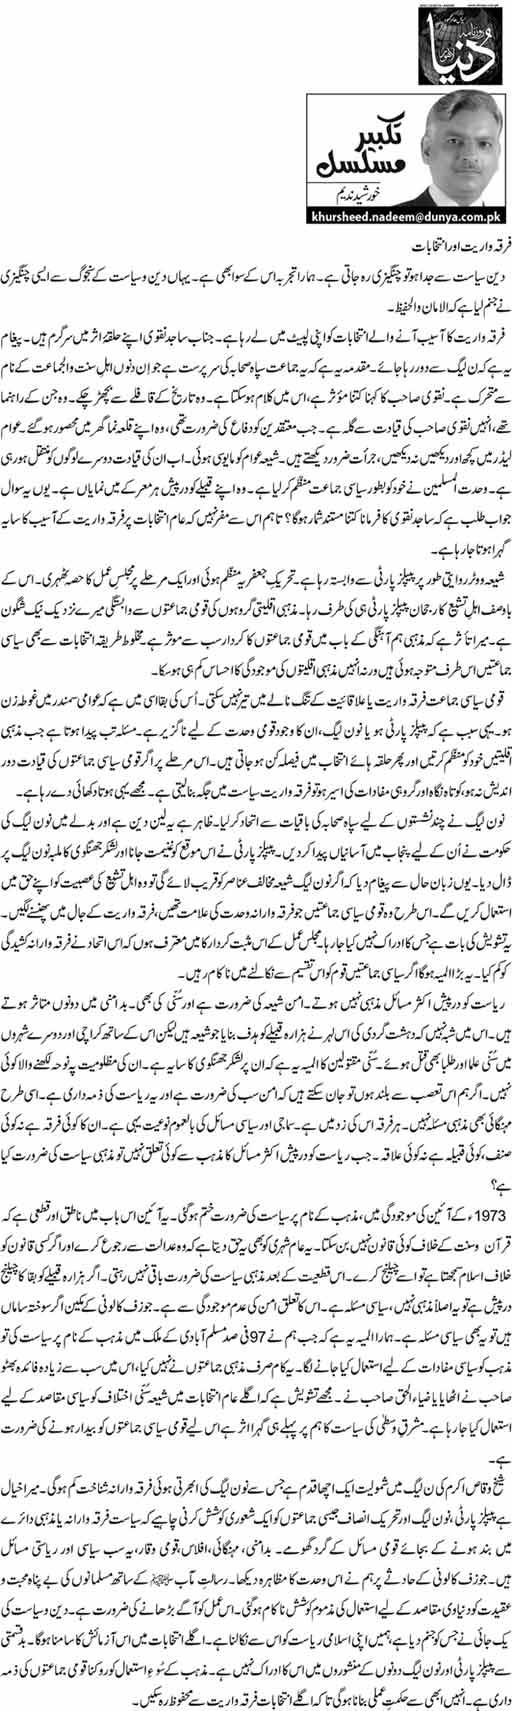 Firka Wariyyat Aur Intikhabaat - Khursheed Nadeem